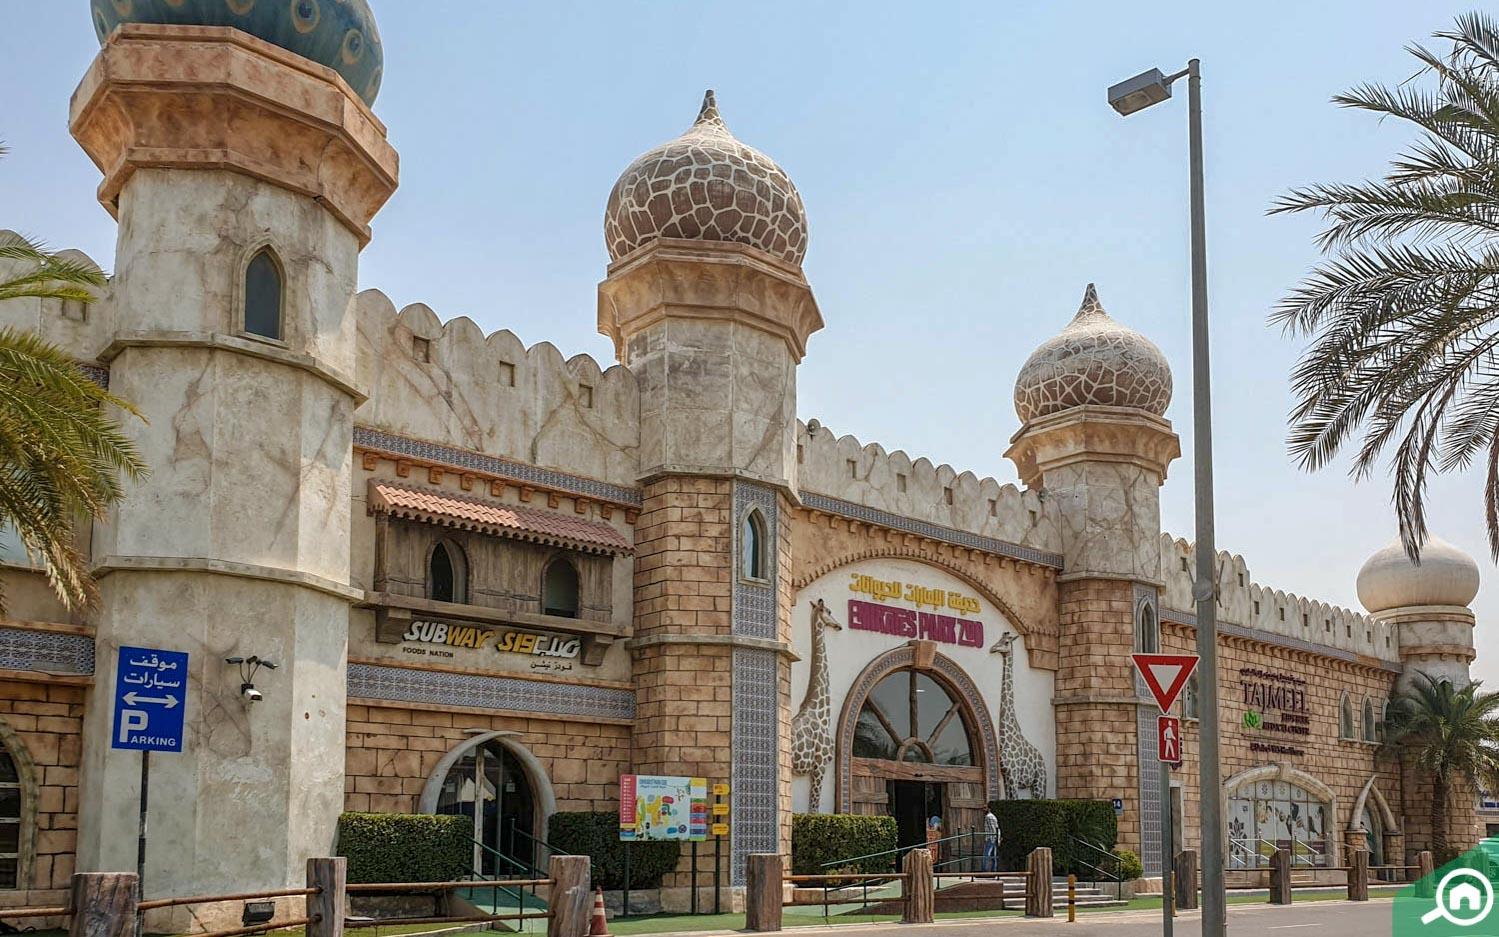 Emirates Park Zoo in Al Bahia